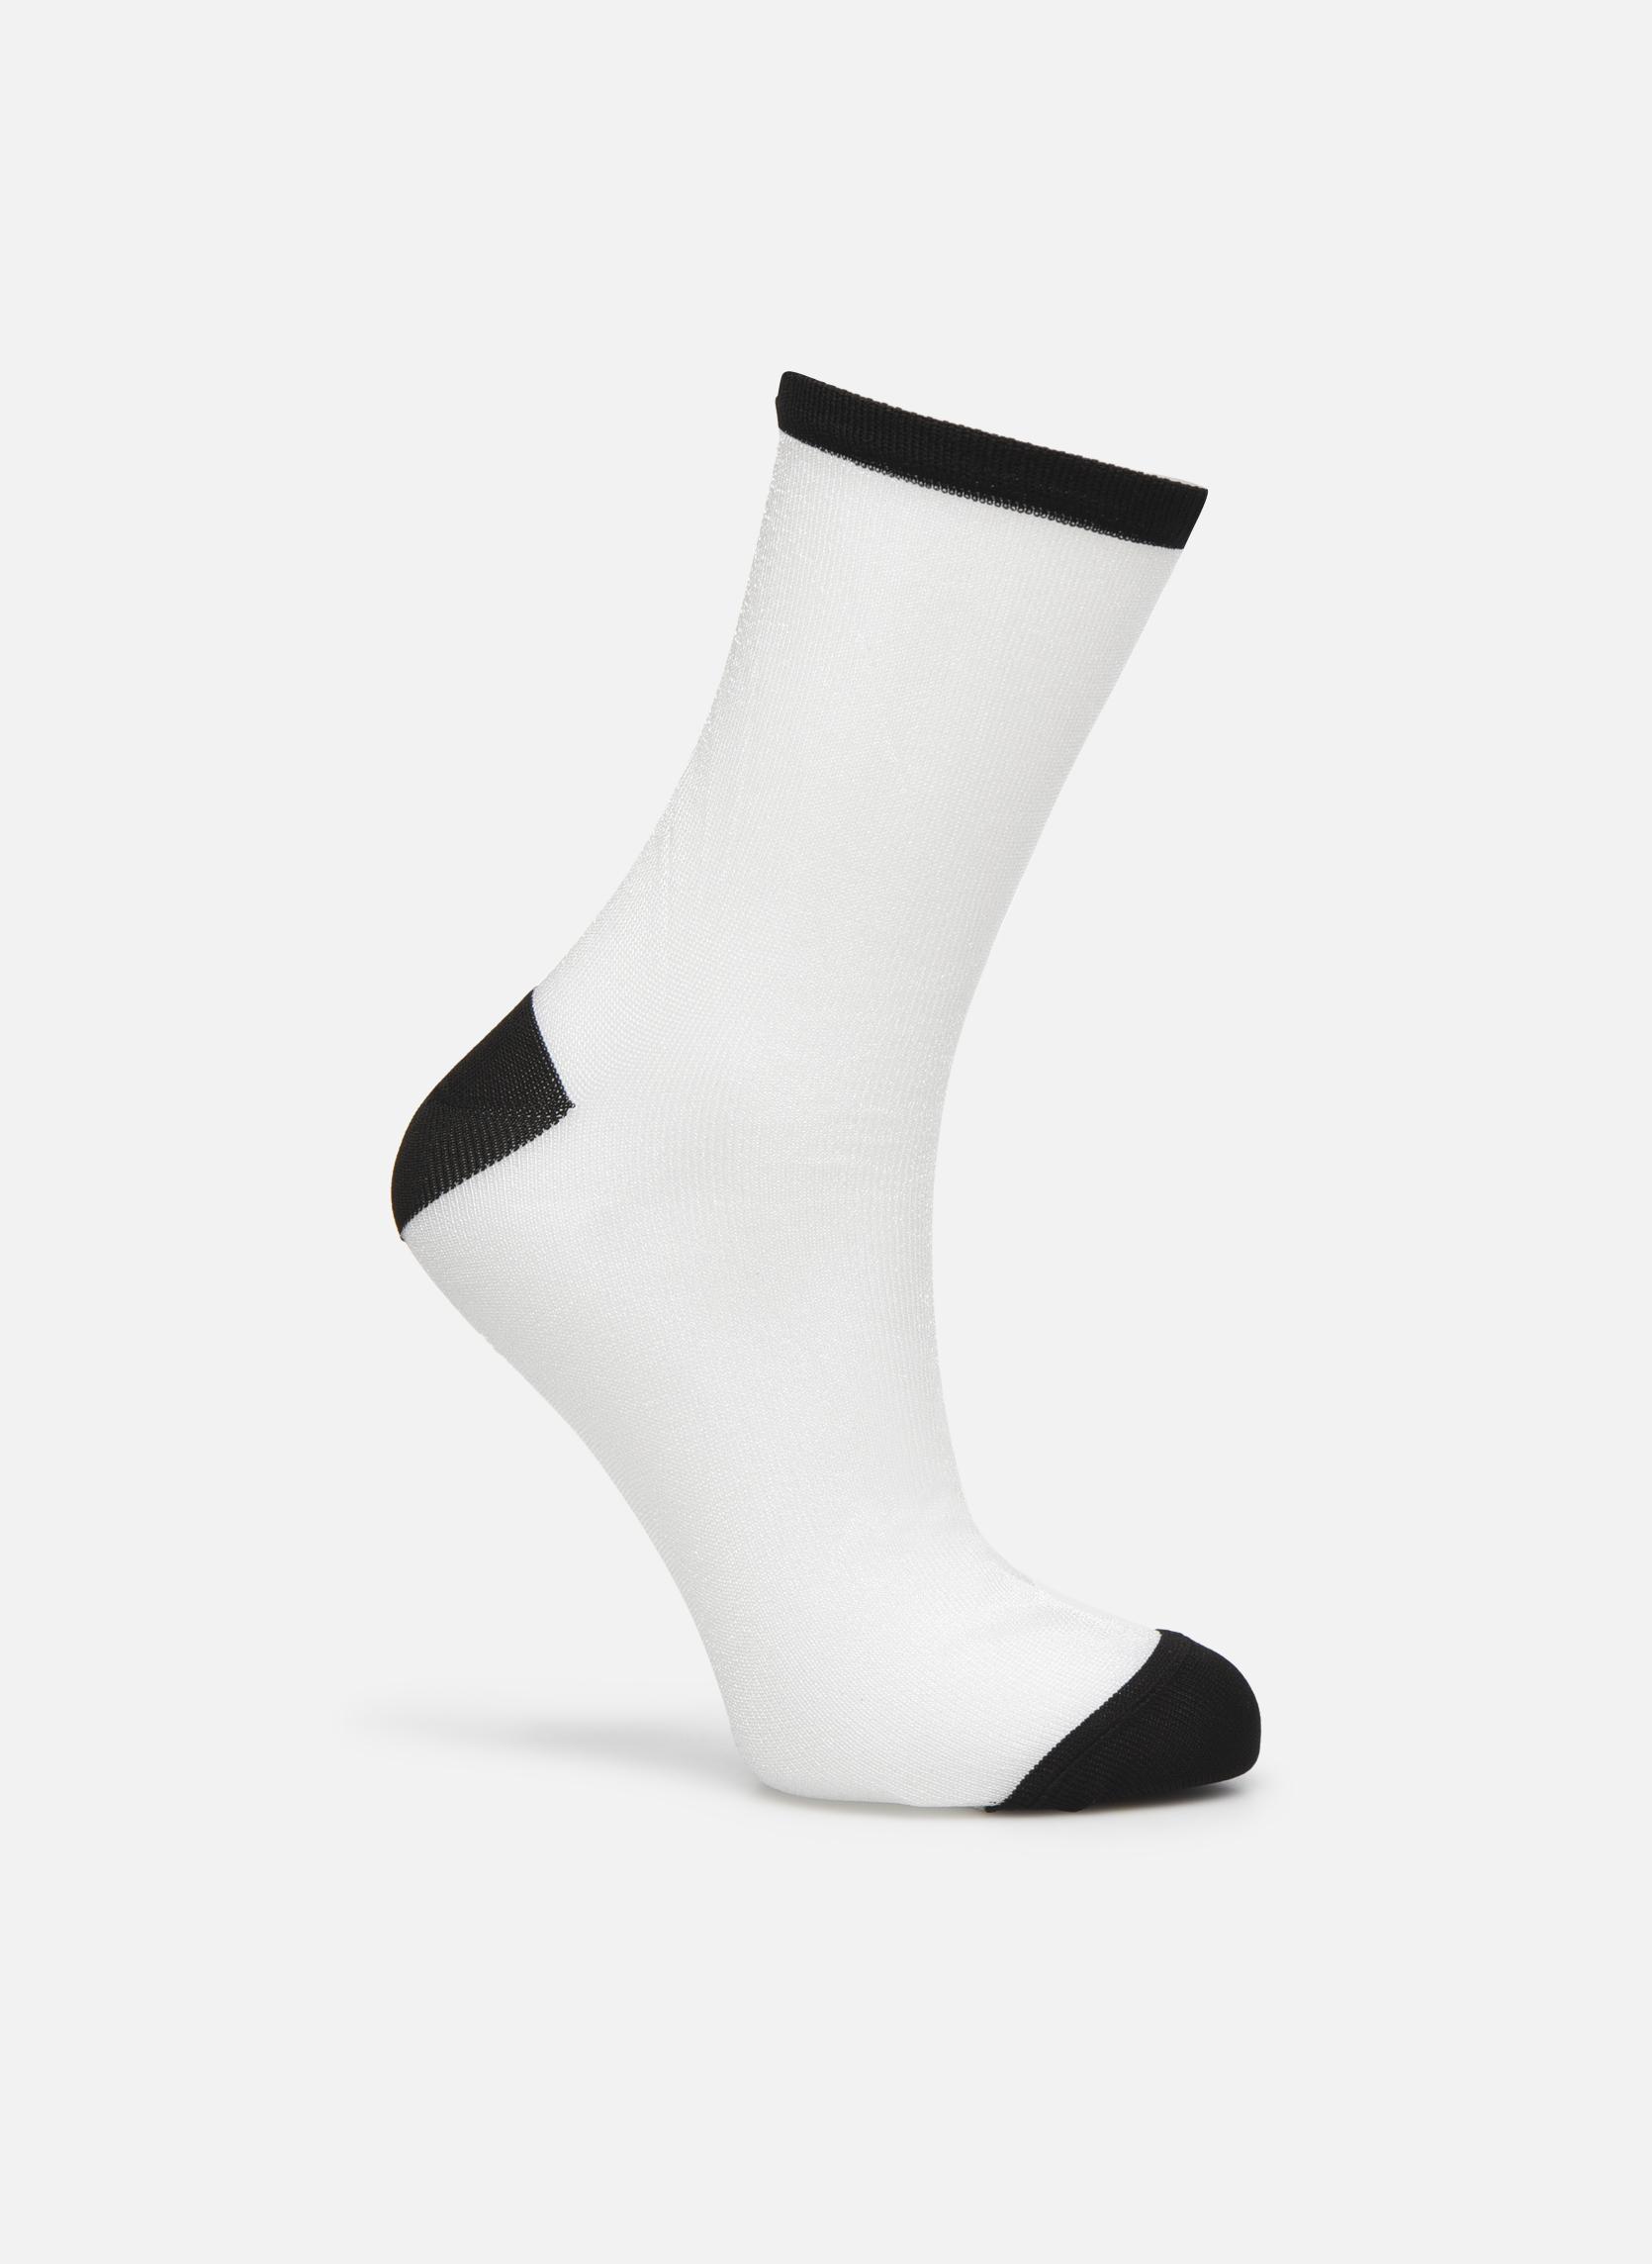 Socks & tights Sarenza Wear Chaussettes transparente Femme White detailed view/ Pair view